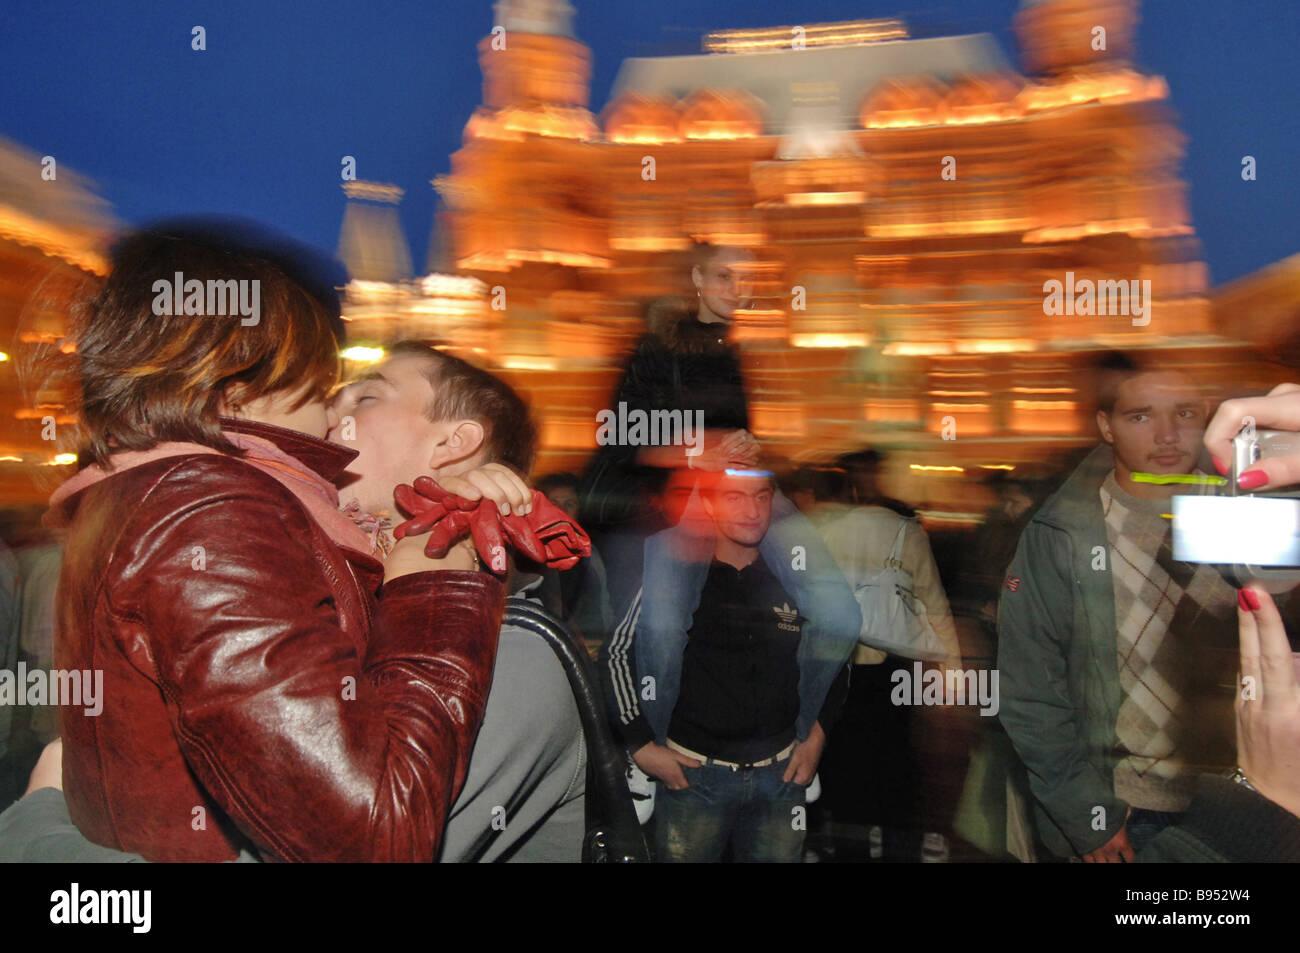 Mosca la città di baci caso Manezhnaya Square Mosca Immagini Stock